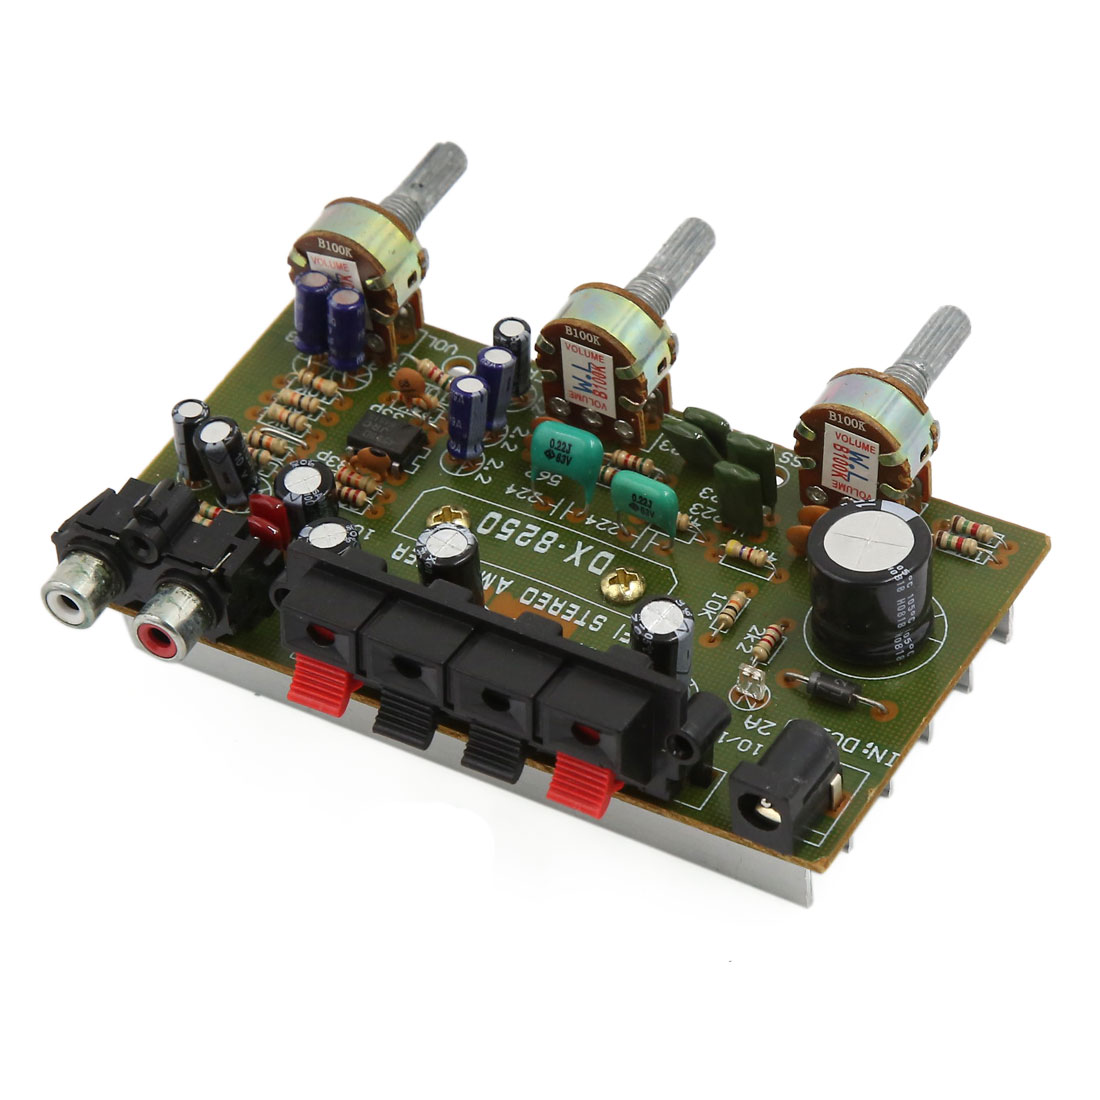 Unique Bargains DC12V LFE Subwoofer Audio Hi-Fi 4 Channel Car Boat Stereo Power Amplifier Board